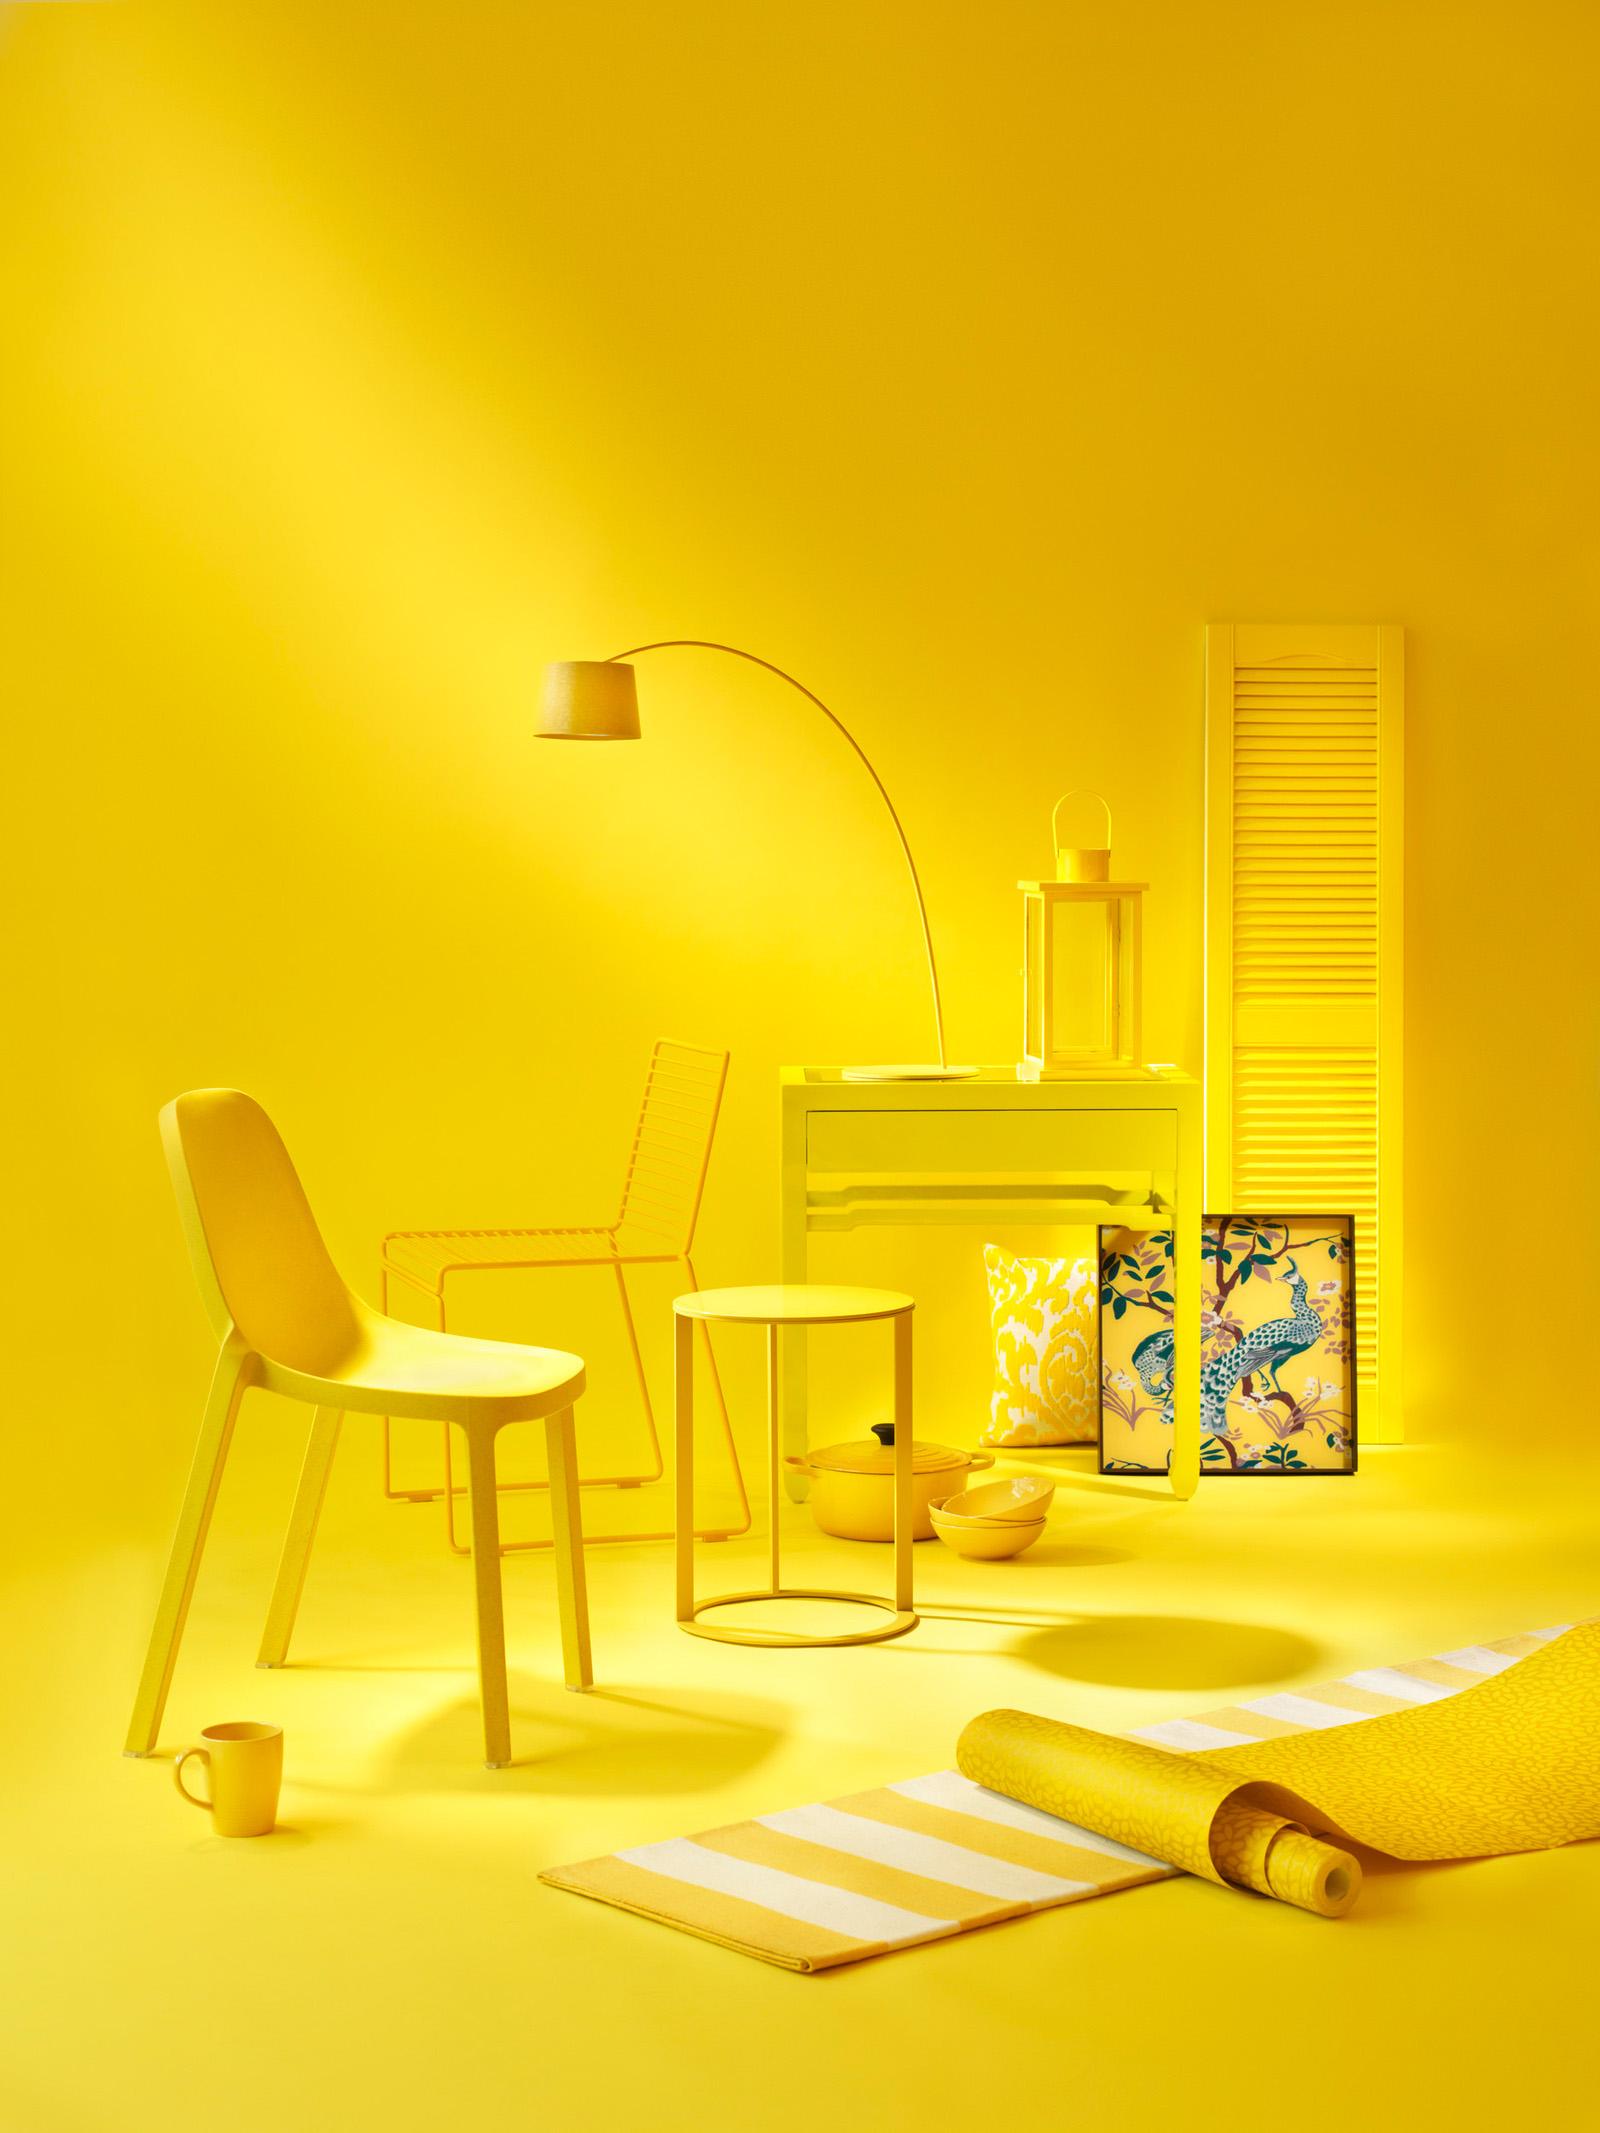 218807-10855136-RF13007GLB_EDT_Yellow_jpg.jpg